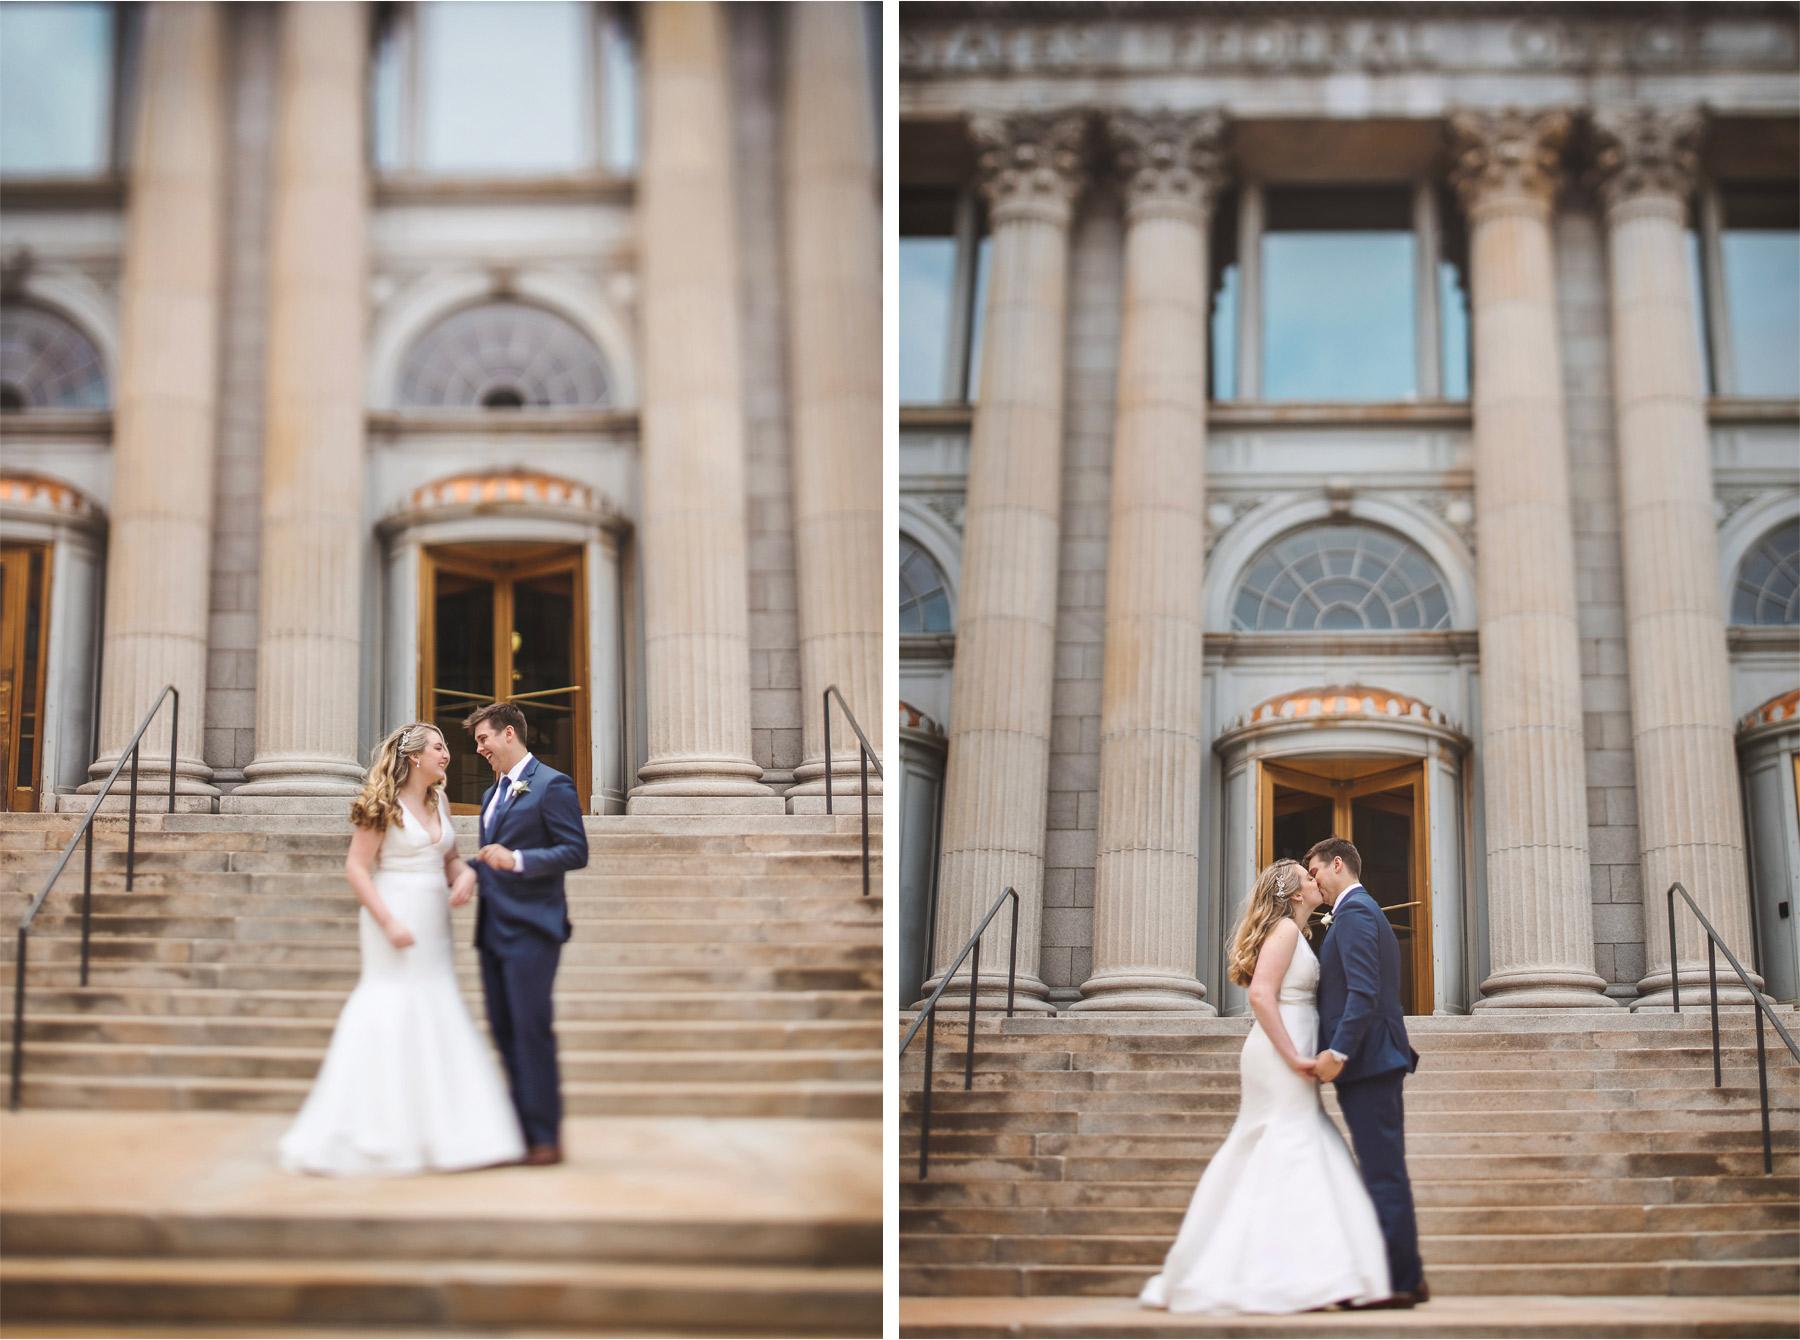 07-Minneapolis-Minnesota-Wedding-Vick-Photography-The-Depot-Bride-Groom-First-Look-Amelia-and-Alexander.jpg